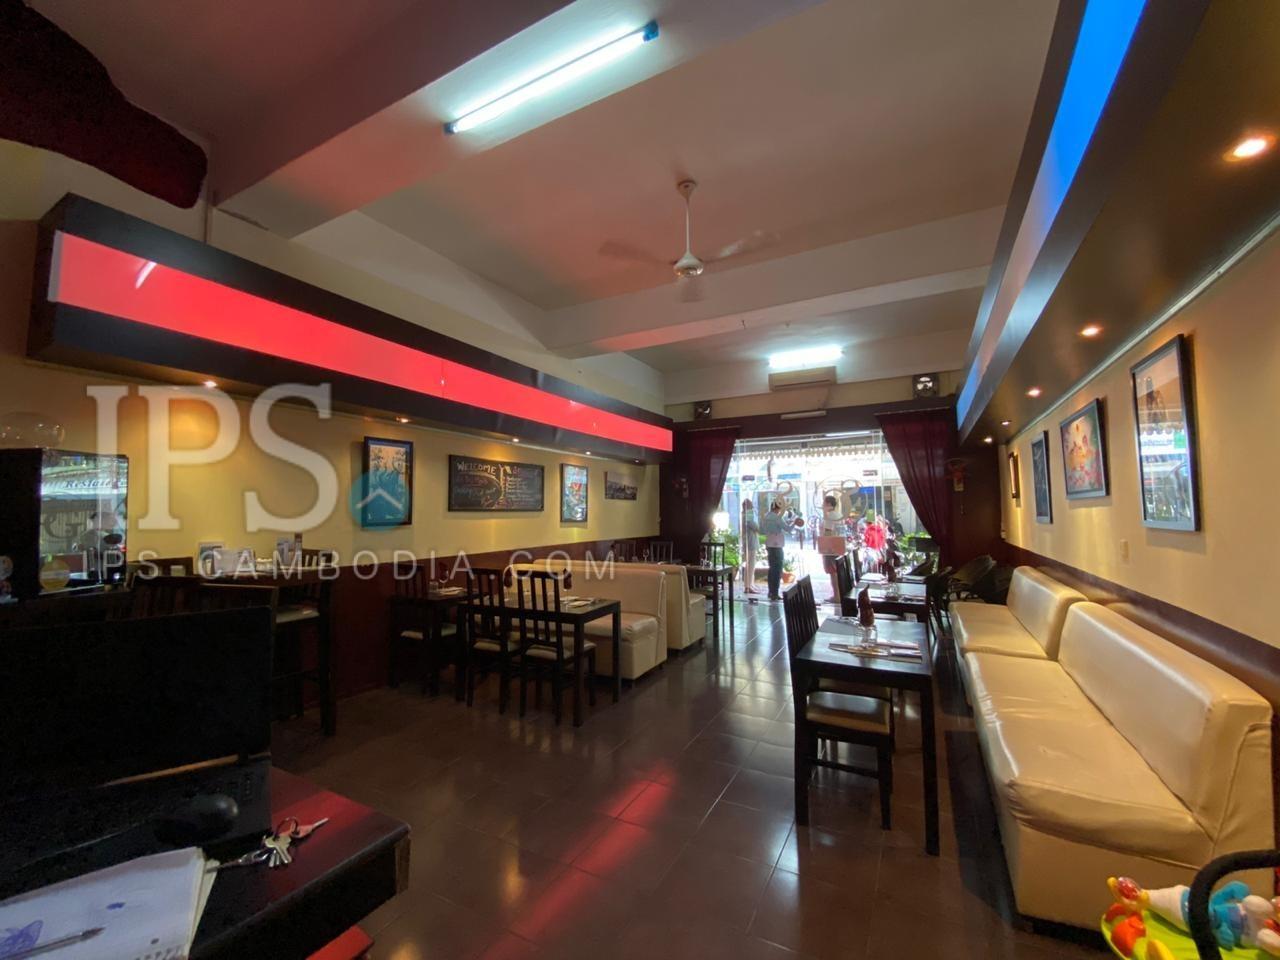 Restaurant Business For Sale - Daun Penh, Phnom Penh